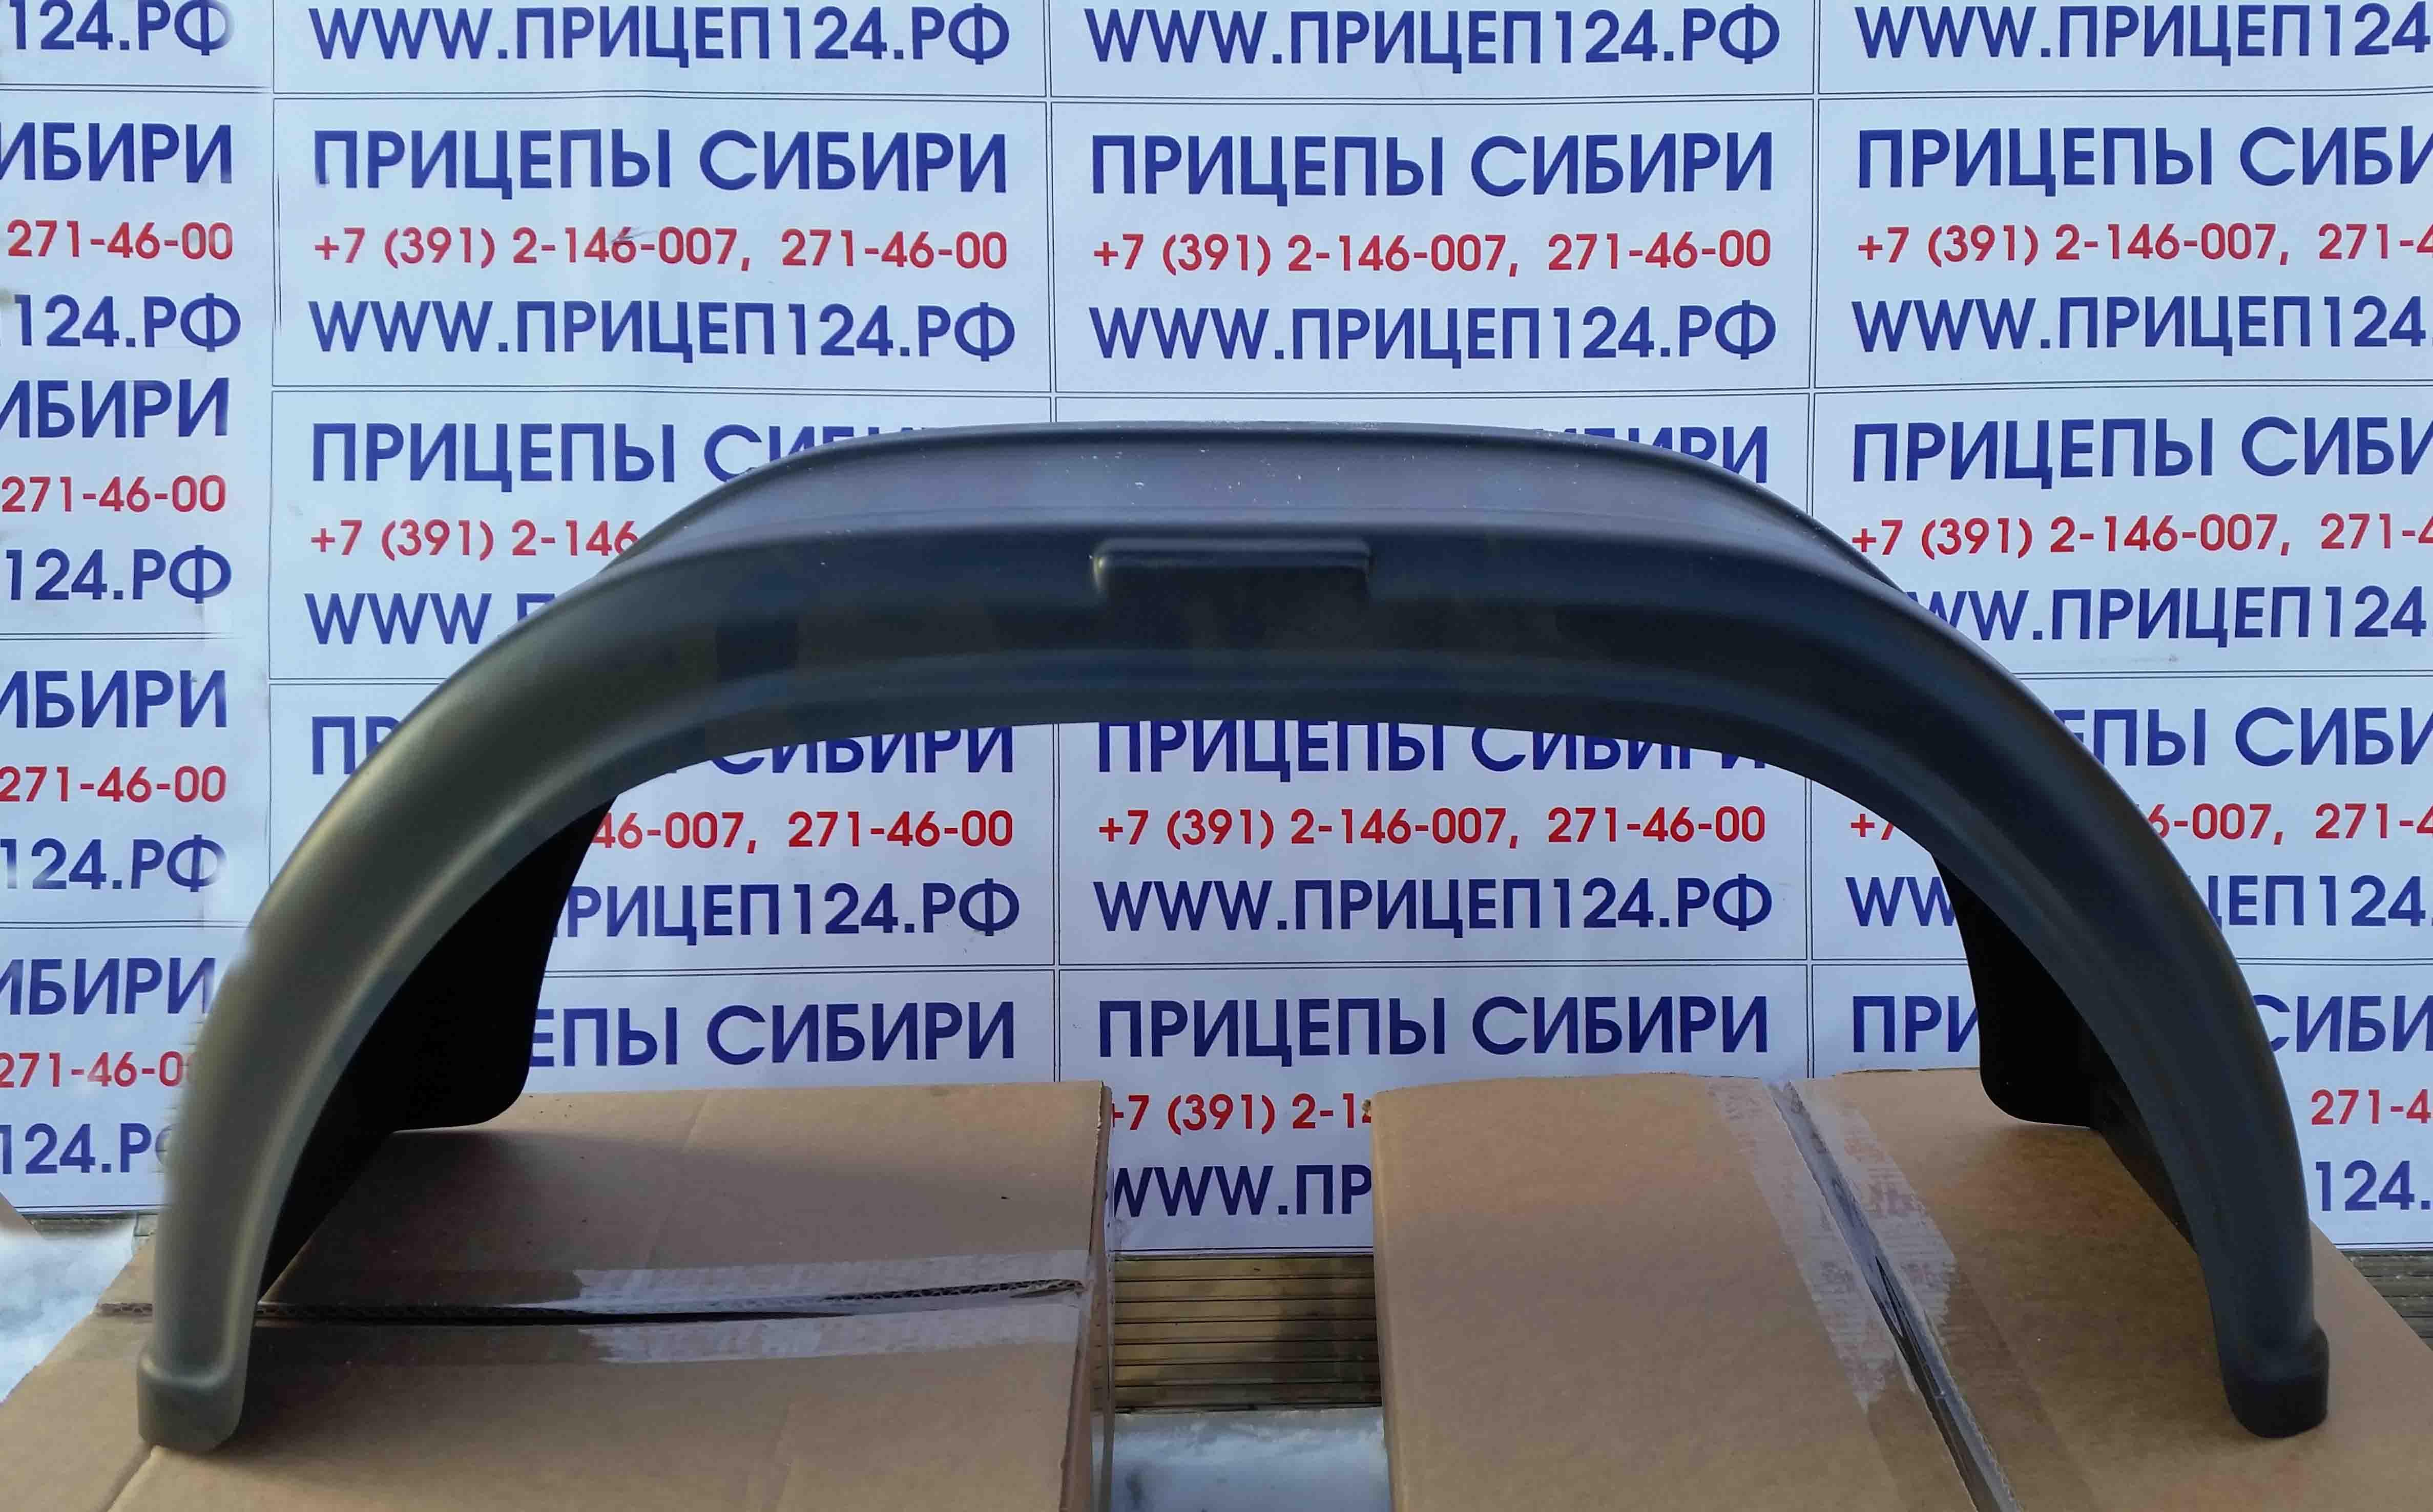 Крыло для прицепа, для колес R15 R16